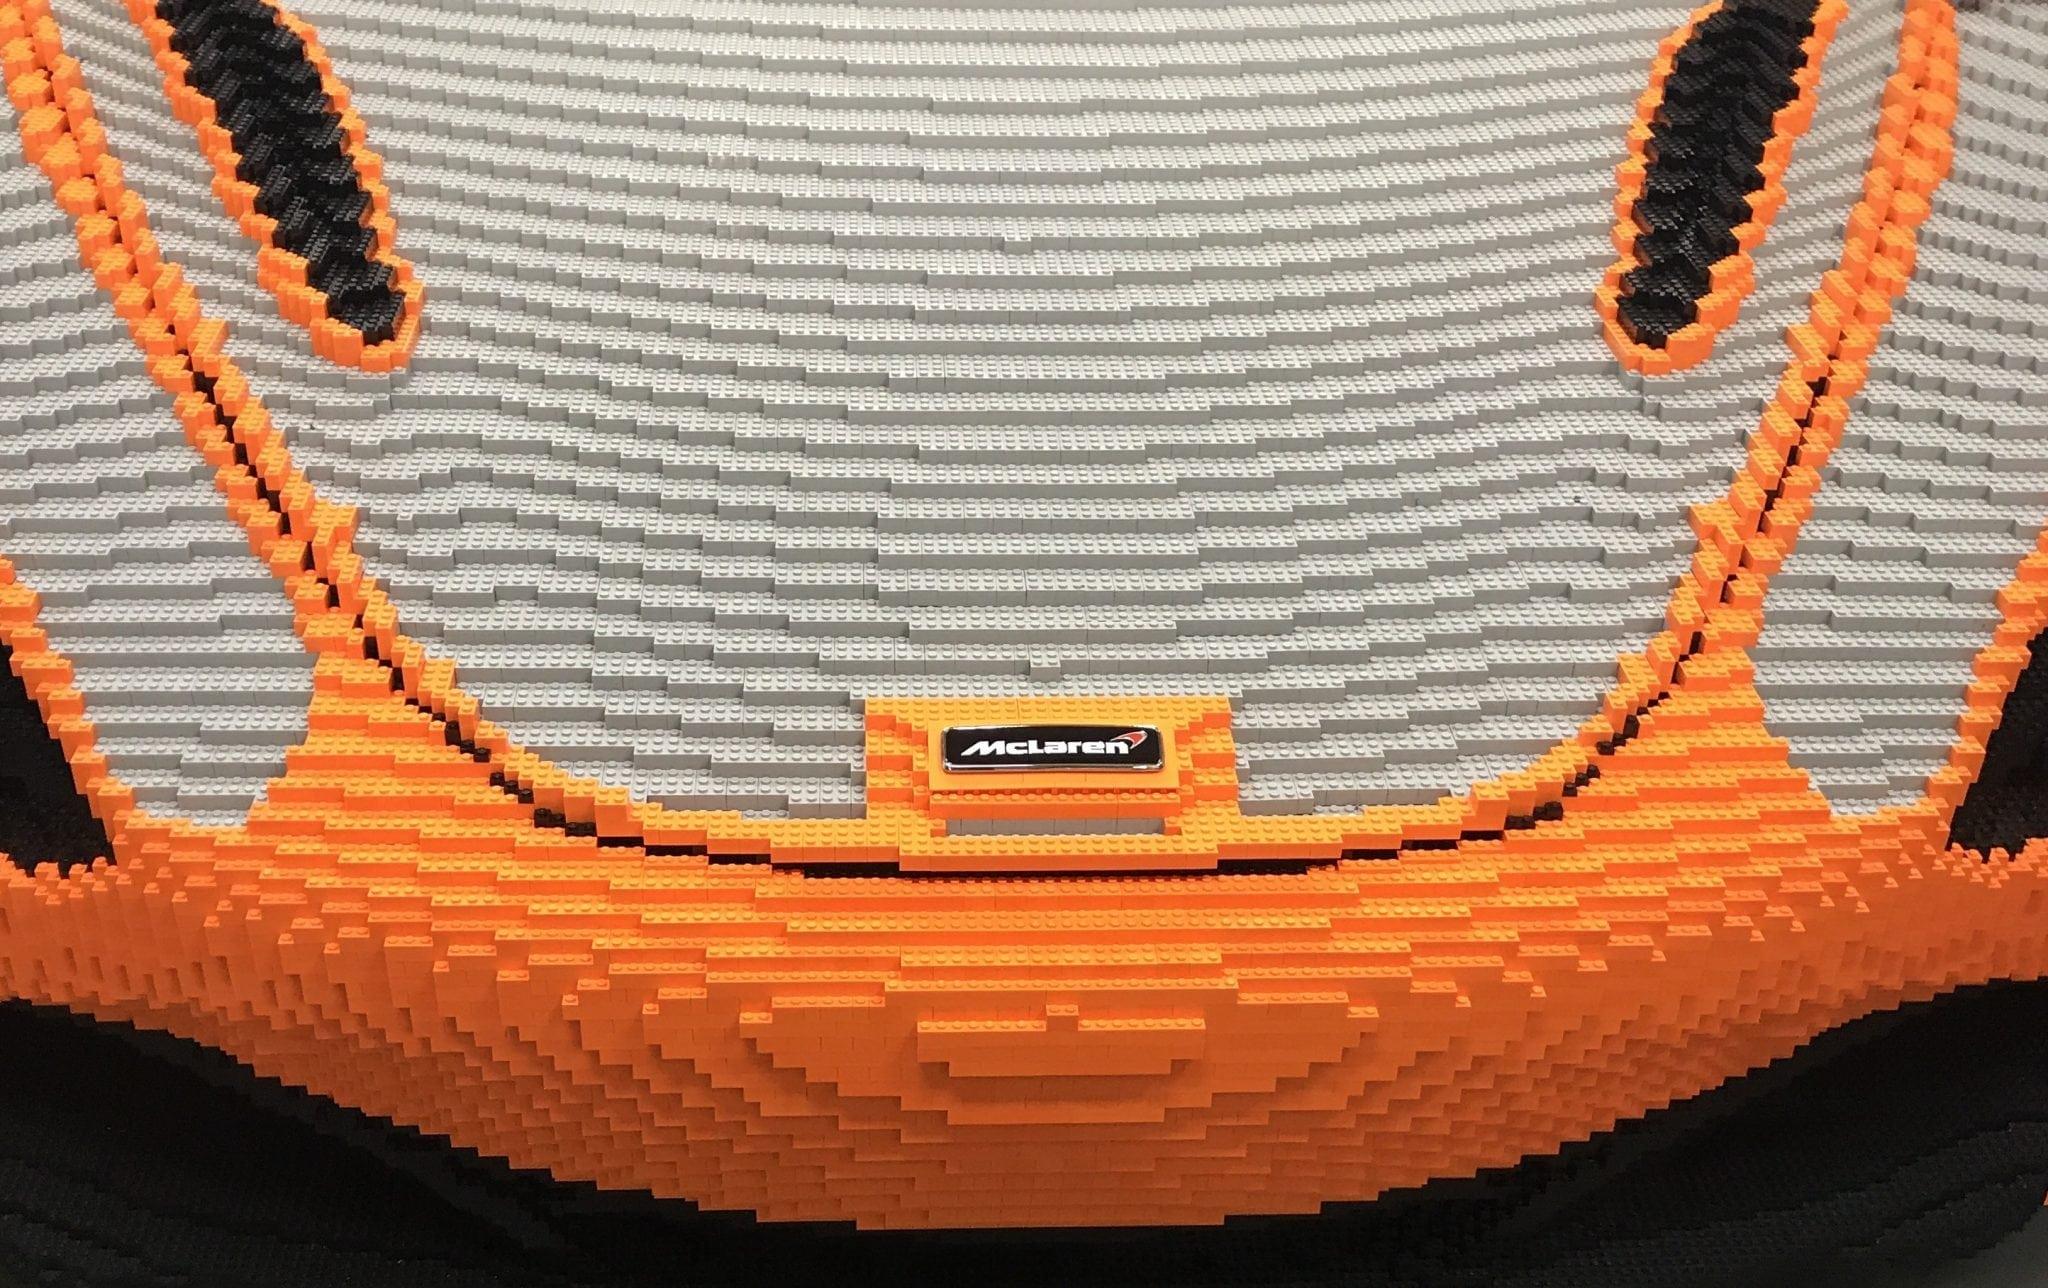 Lego McLaren 720S Build Day